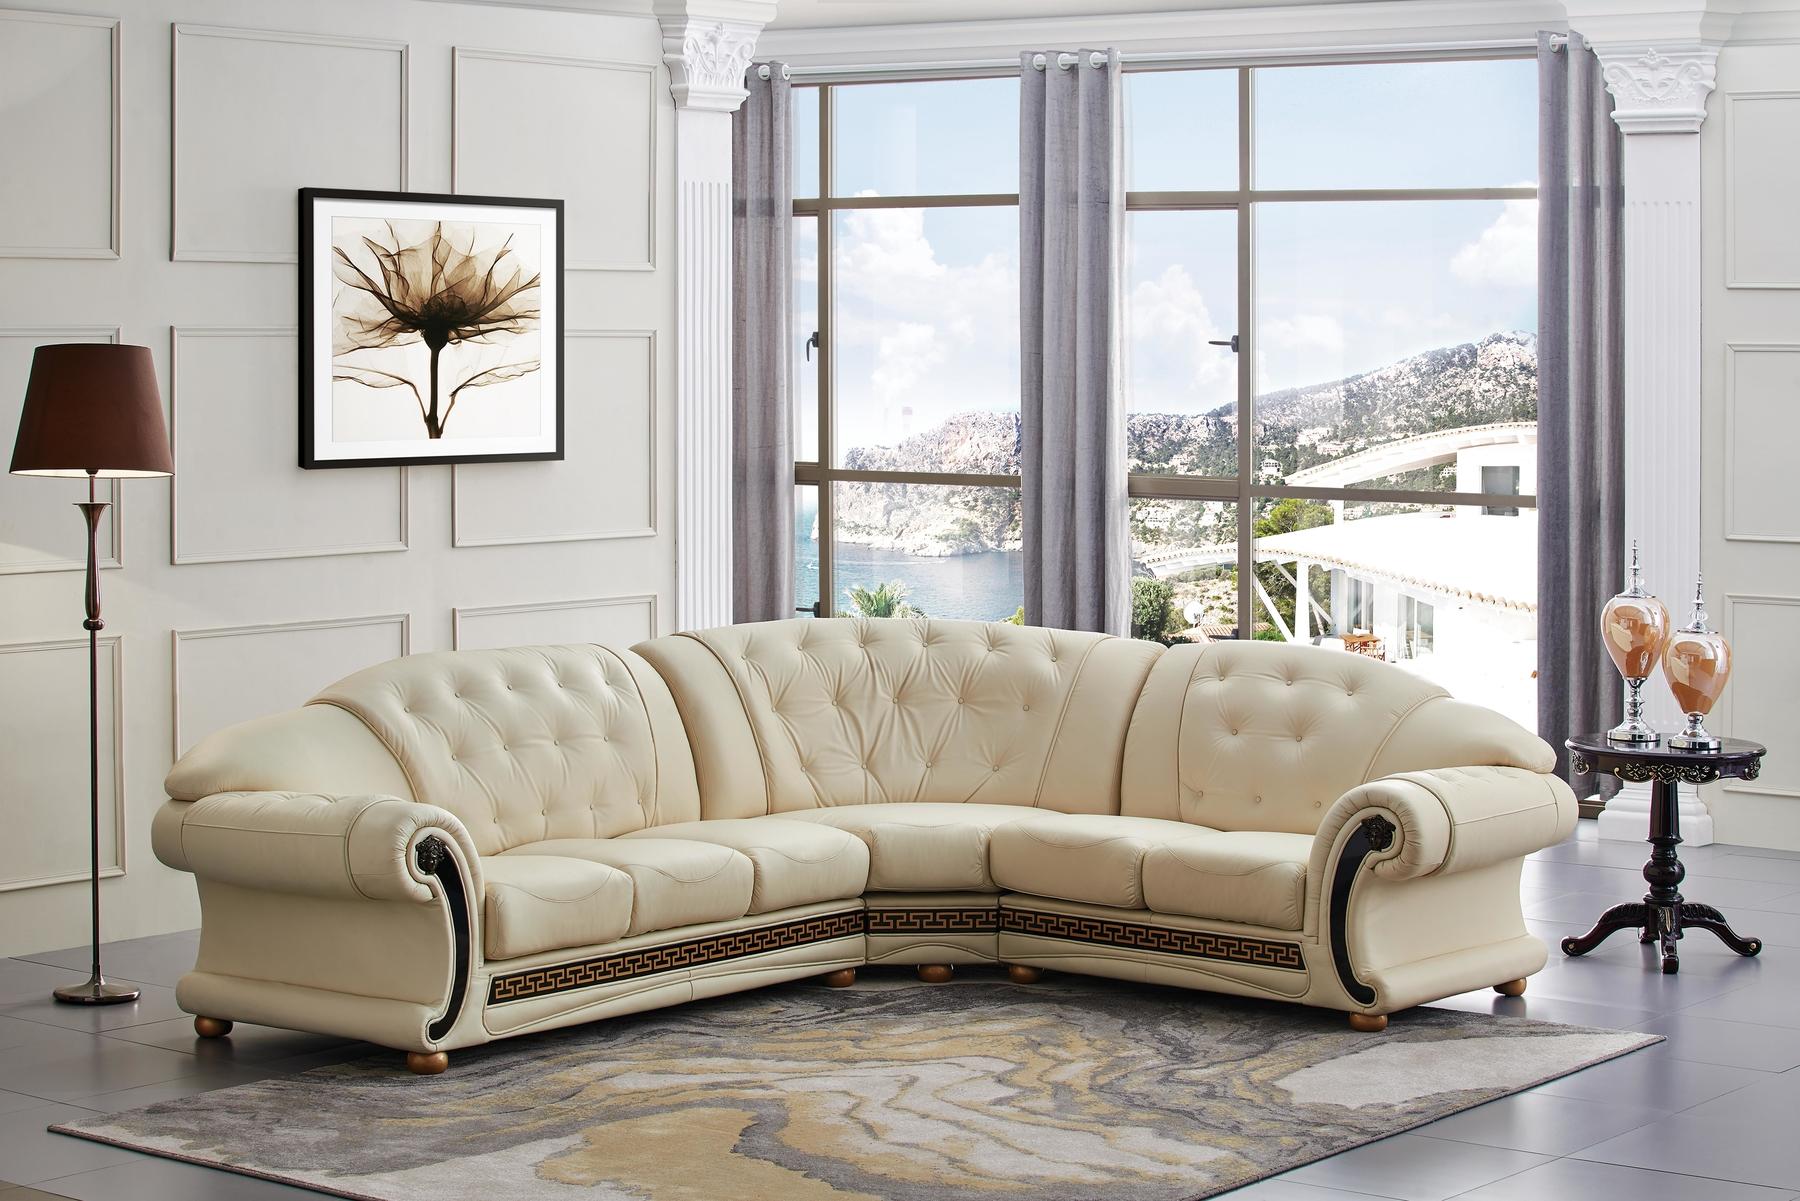 Miraculous Versace Rf Ivory Sectional Sofa Creativecarmelina Interior Chair Design Creativecarmelinacom